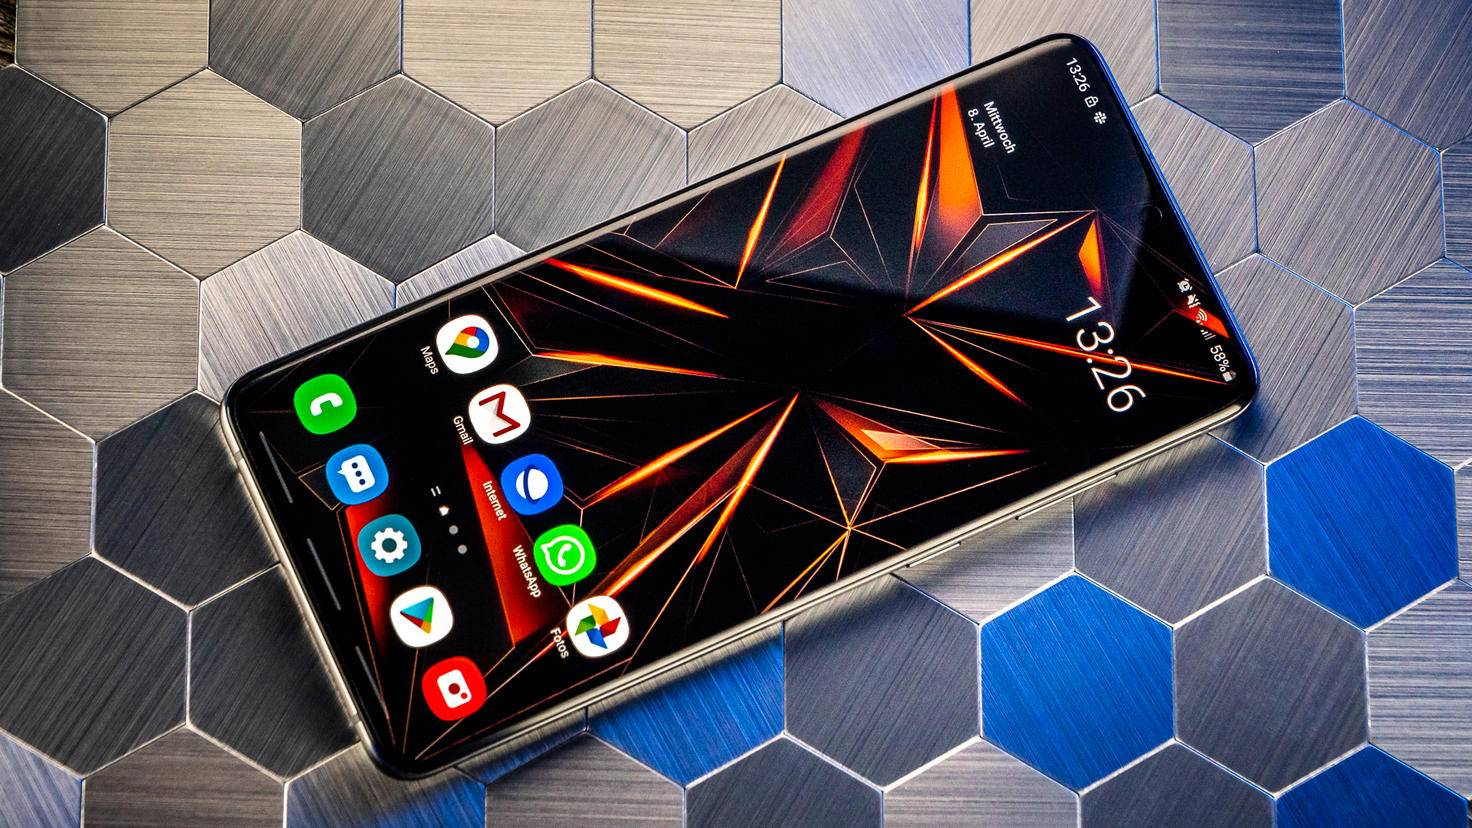 Samsung-Galaxy-S20-Plus-02